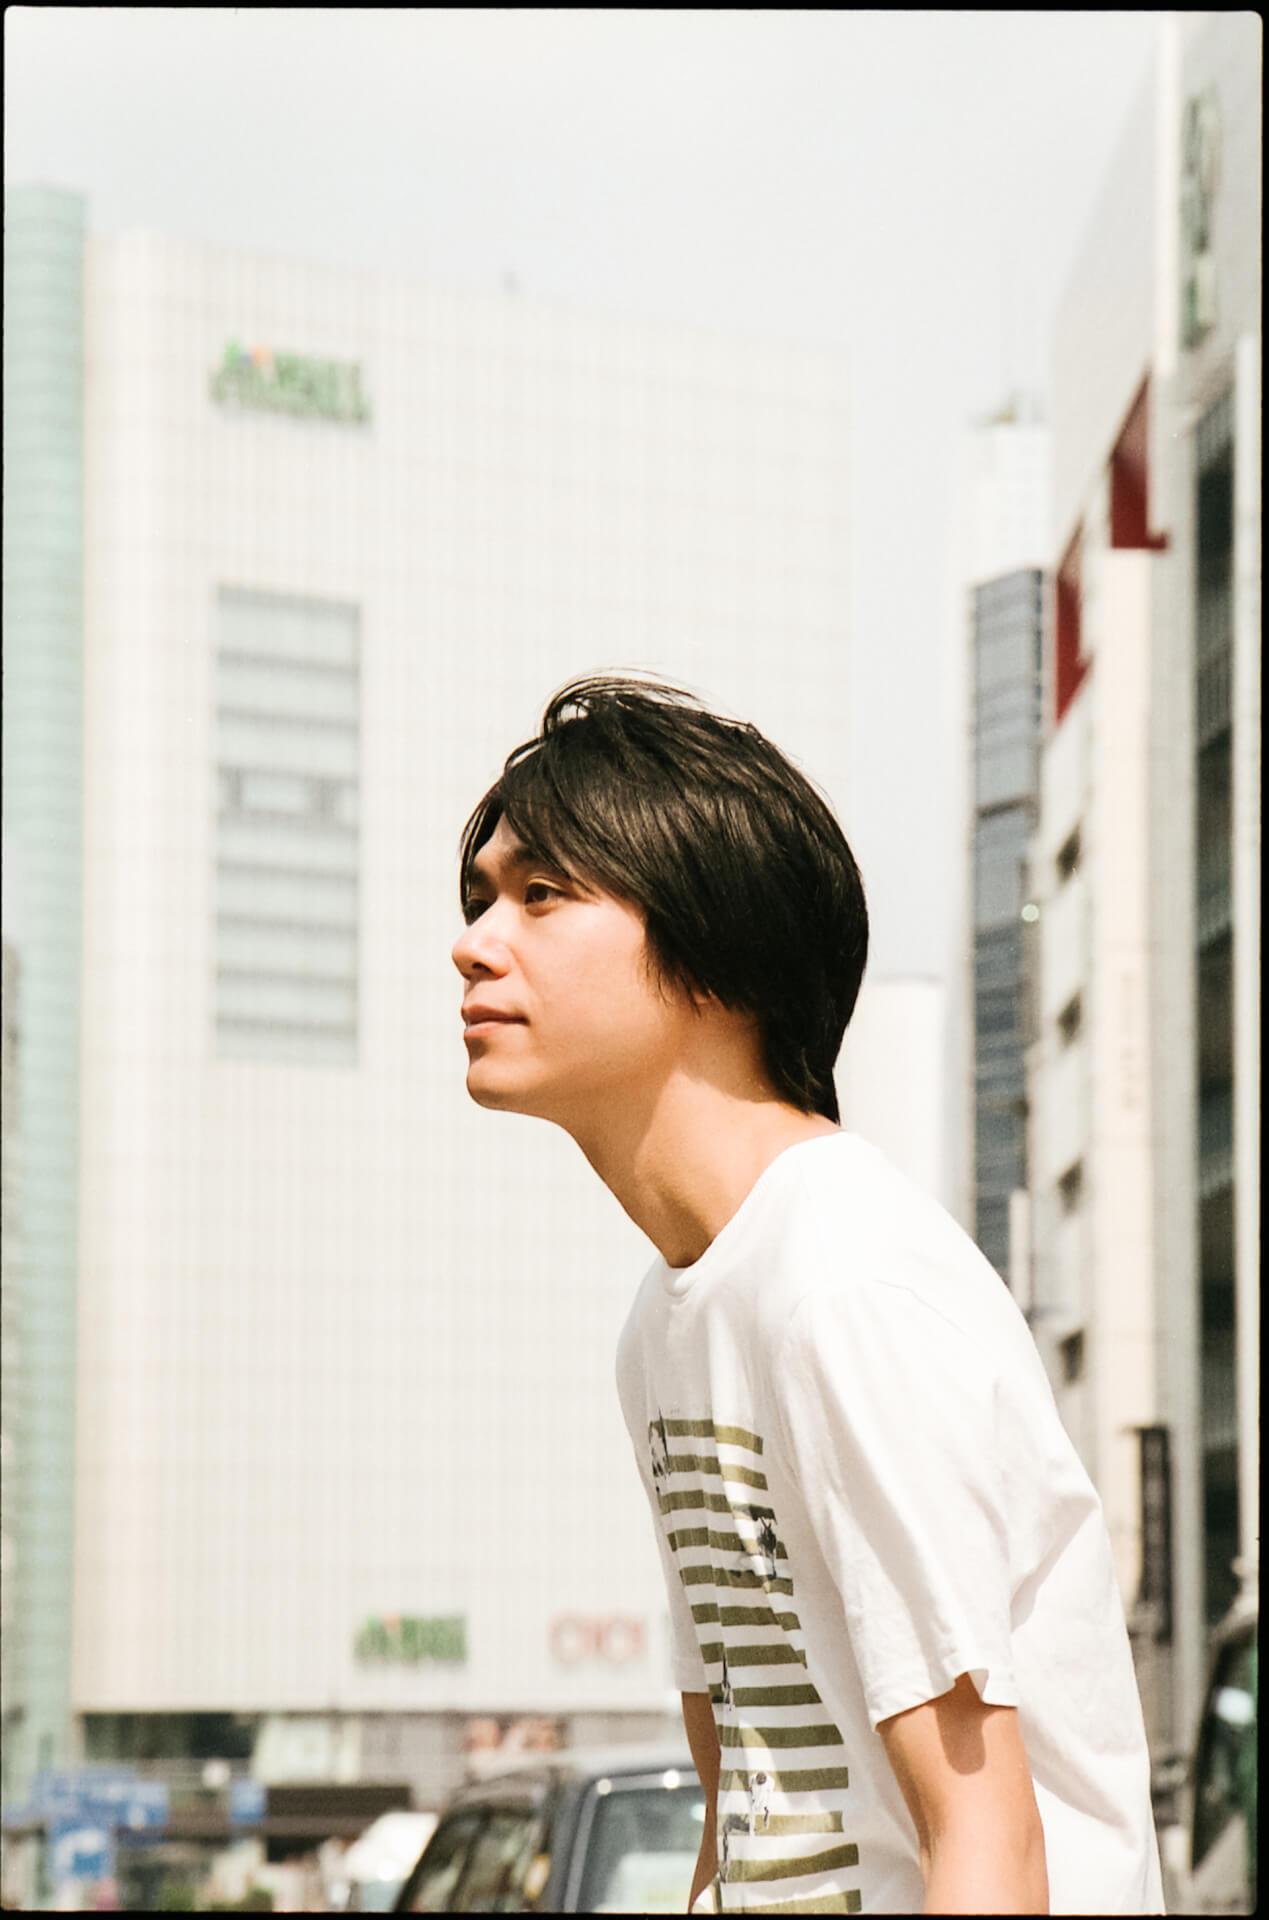 <LIVEWIRE>オープニングシリーズ第2弾に出演するアーティストが決定!yonige、小山田壮平、TENDREなど5組 music2020729_livewire2